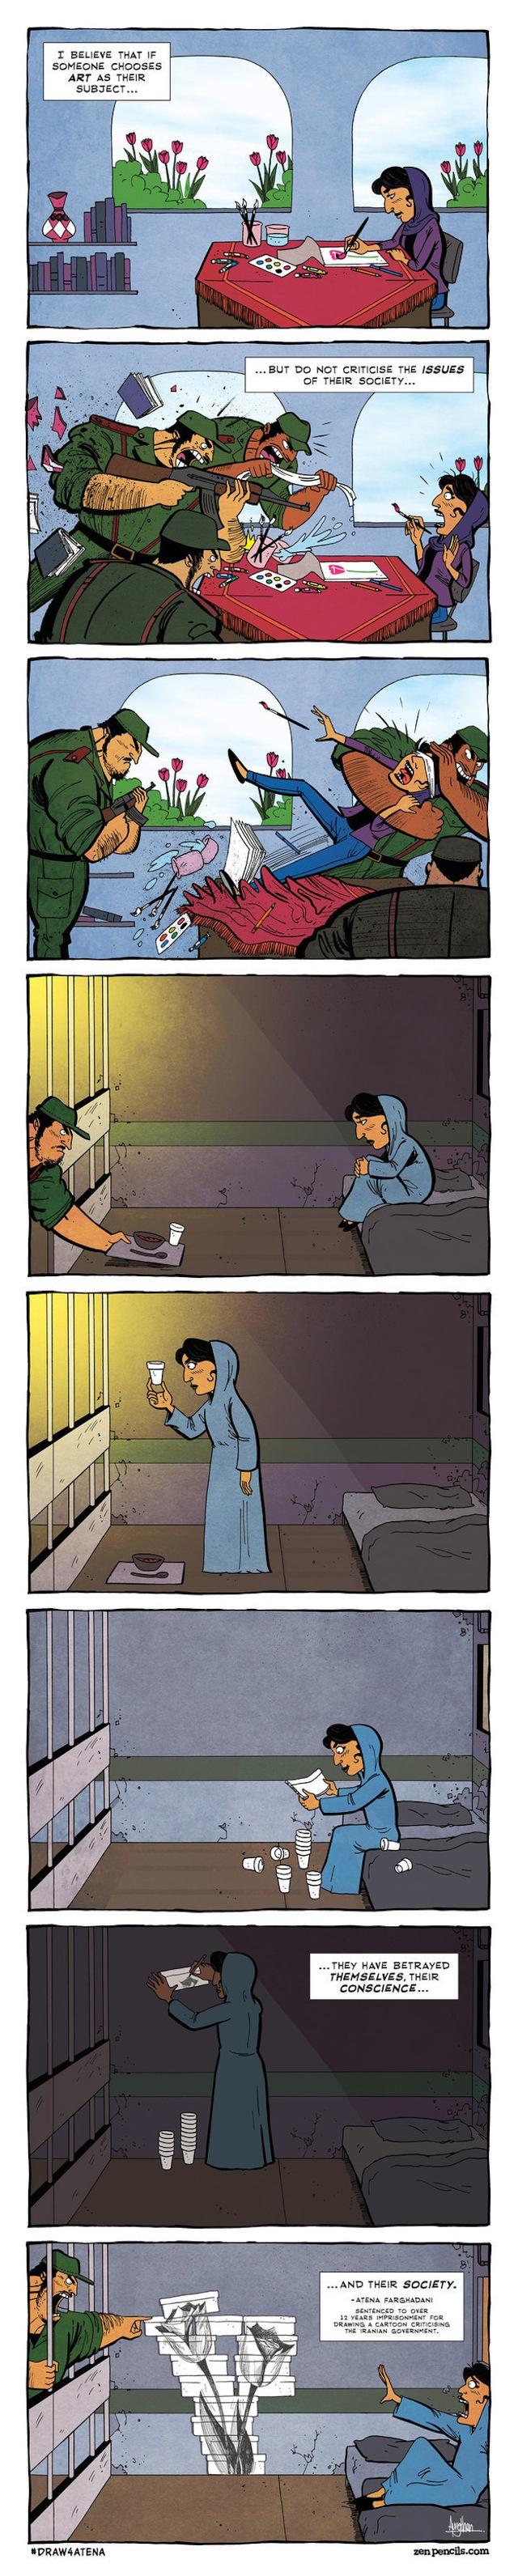 Cartoon by Gavin Aung Than (Image via zenpencils.com)